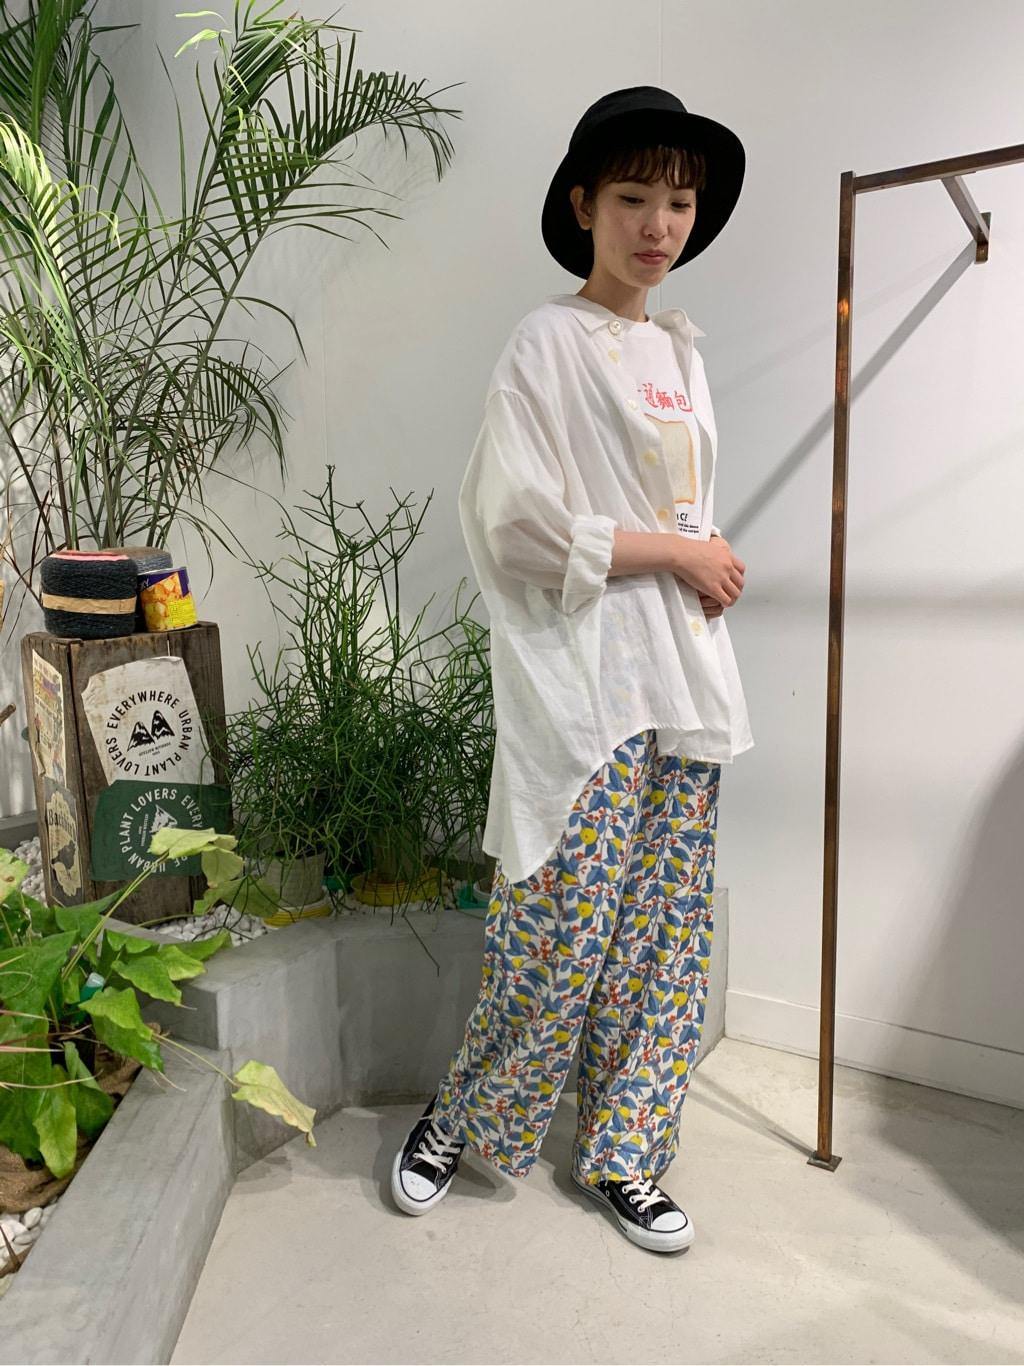 l'atelier du savon 名古屋栄路面 身長:161cm 2020.07.22